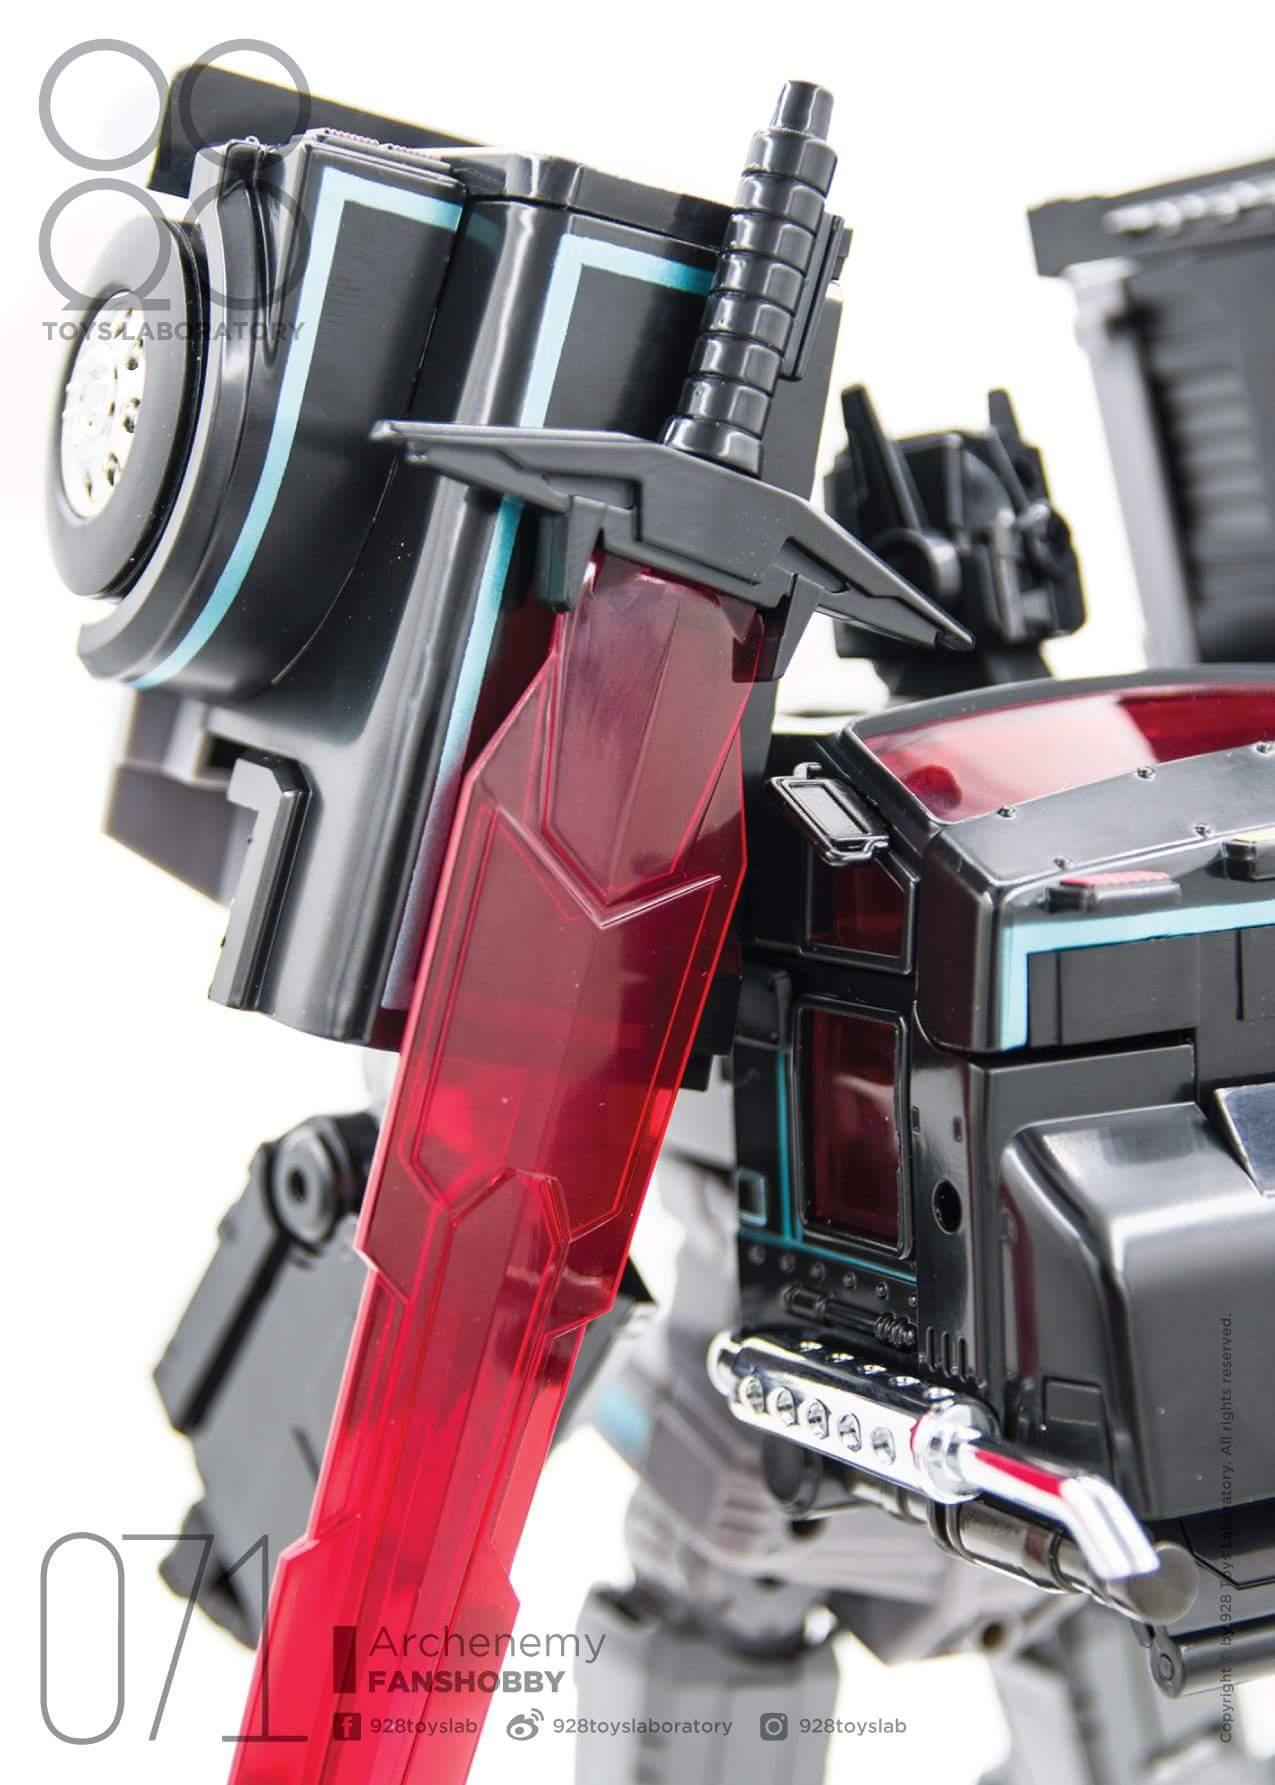 [FansHobby] Produit Tiers - Master Builder MB-01 Archenemy (aka Scourge RID 2000),  MB-04 Gunfighter II (aka Laser Optimus G2) et MB-09 Trailer (remorque) 7l4djMxr